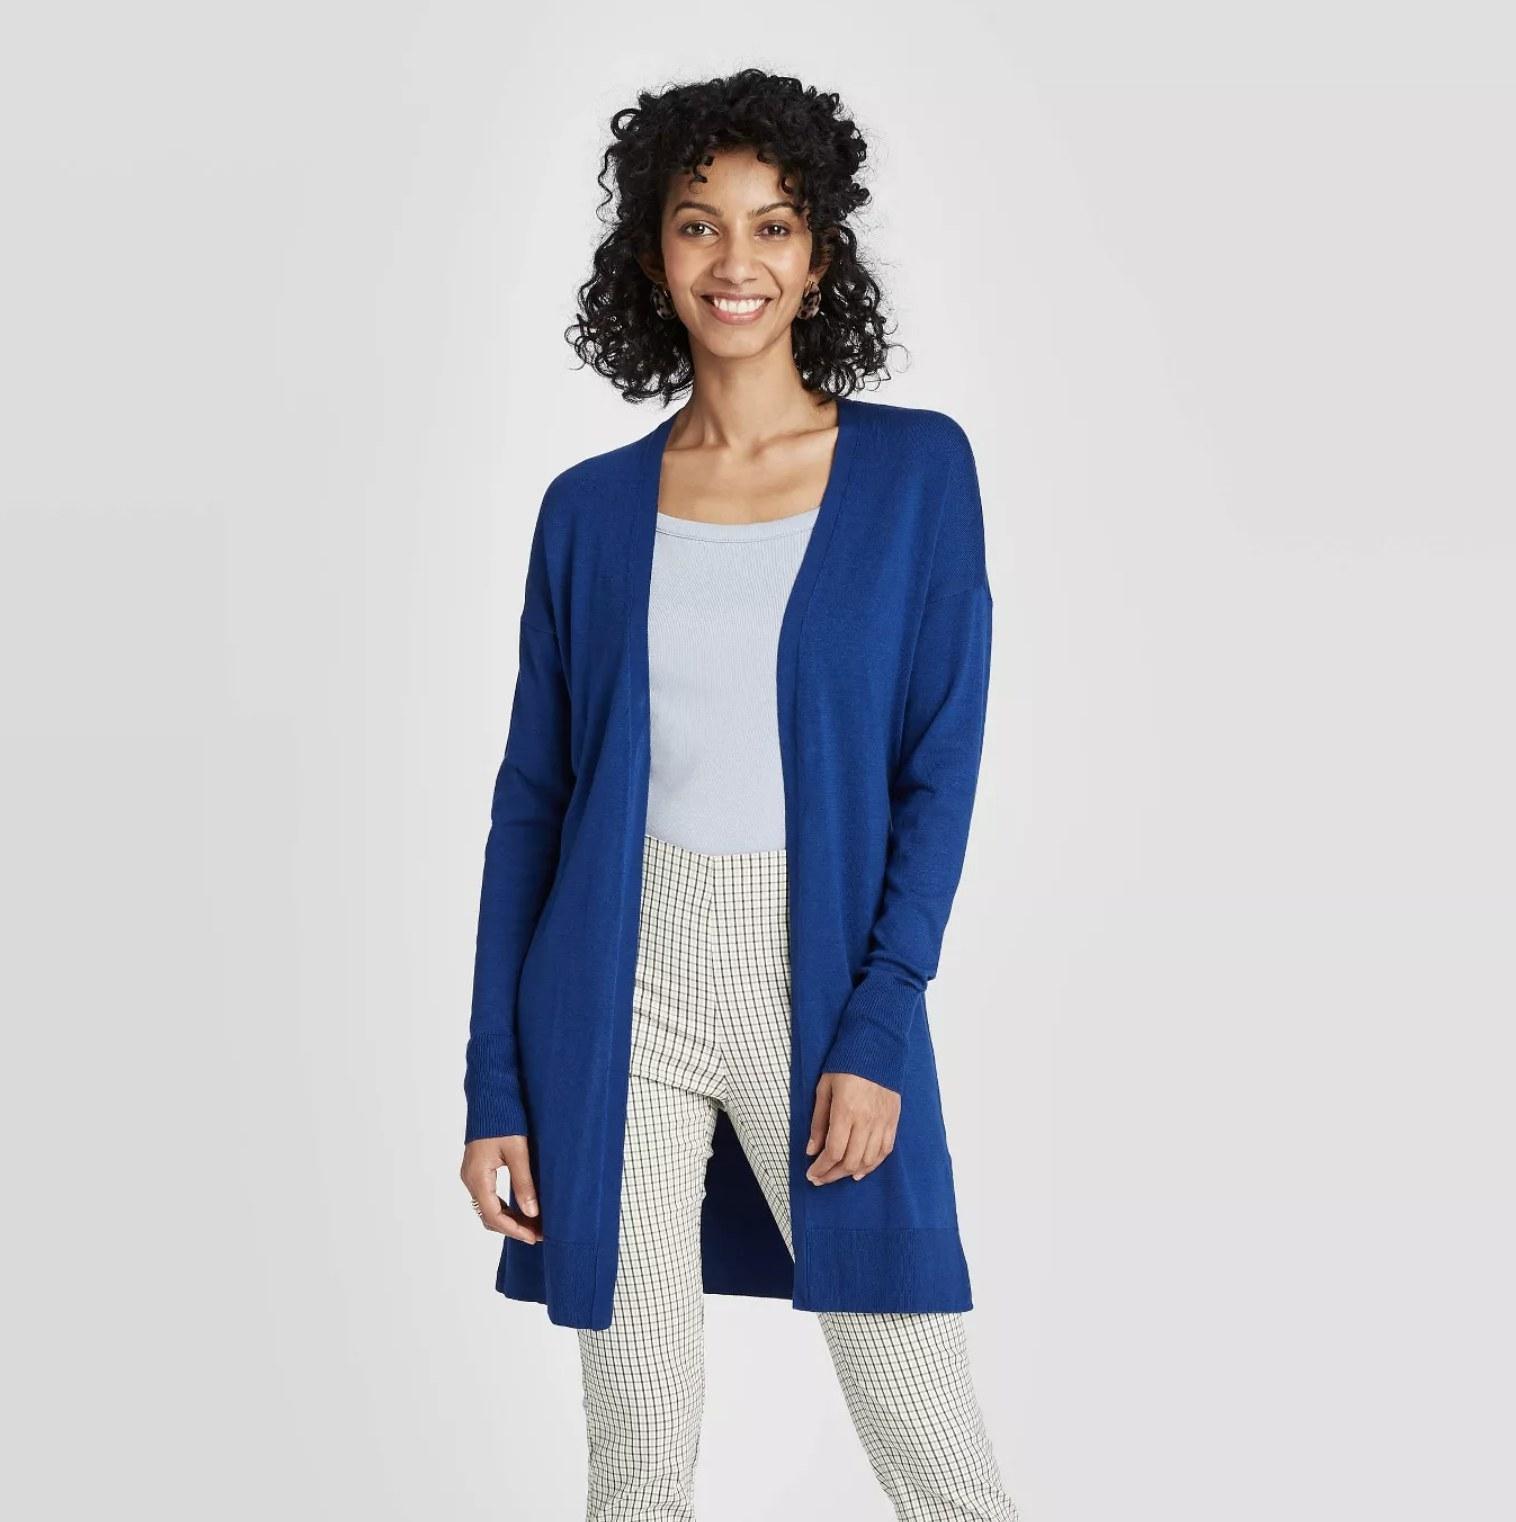 Model wearing the long open cardigan in royal blue